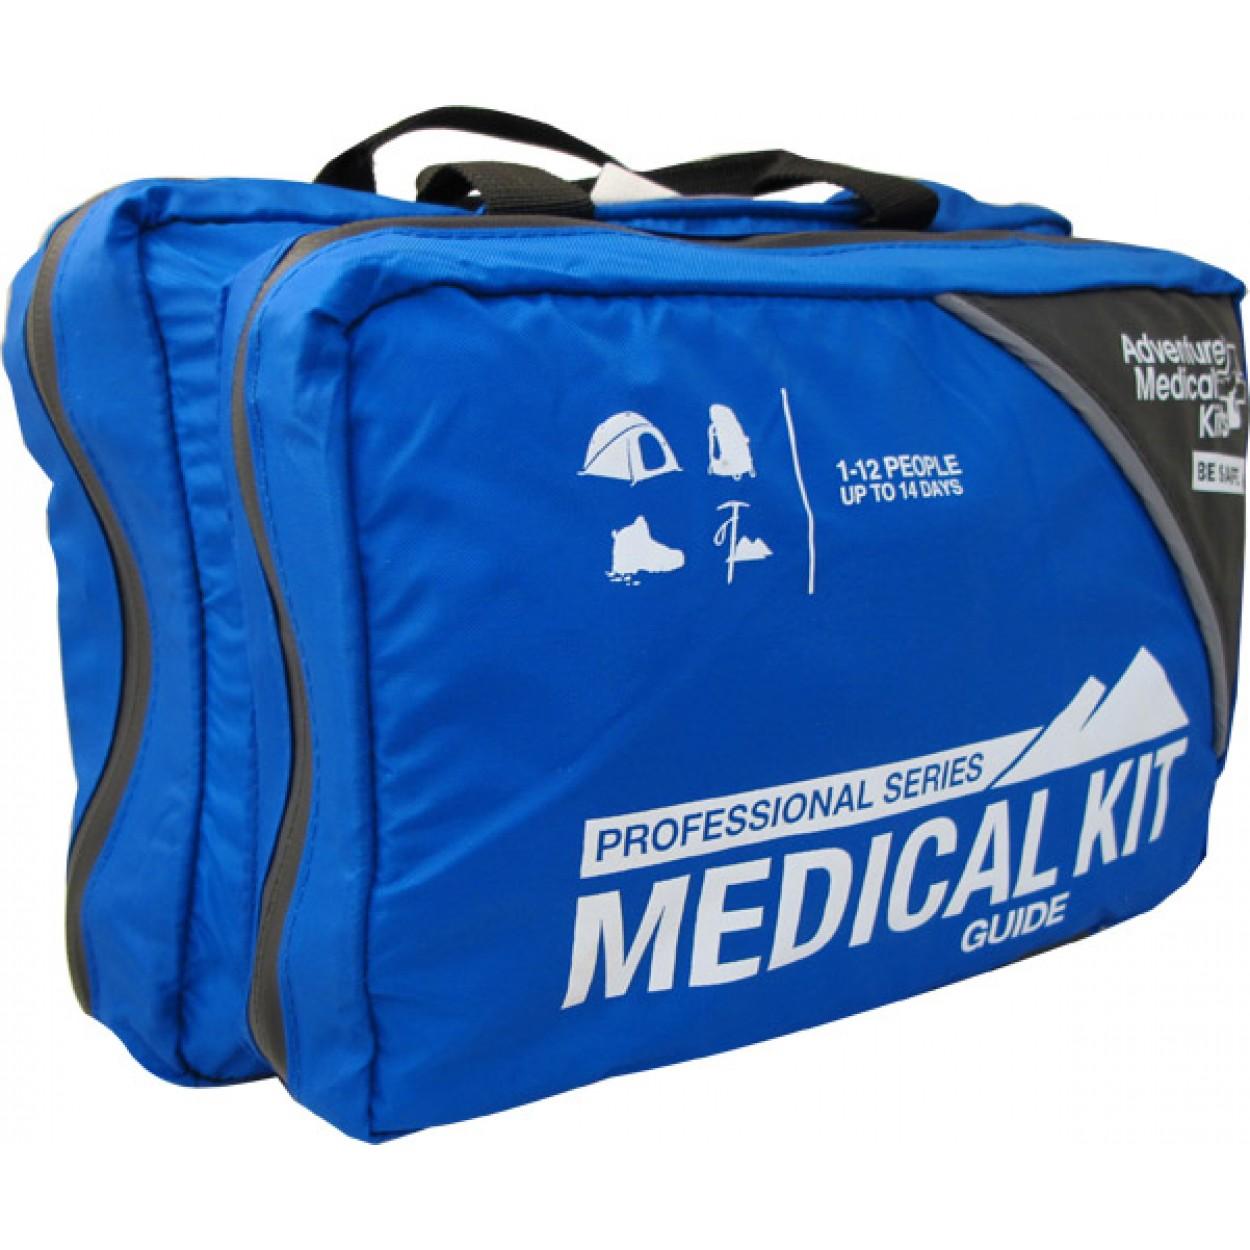 Professiocal_Medical_Kit.jpg